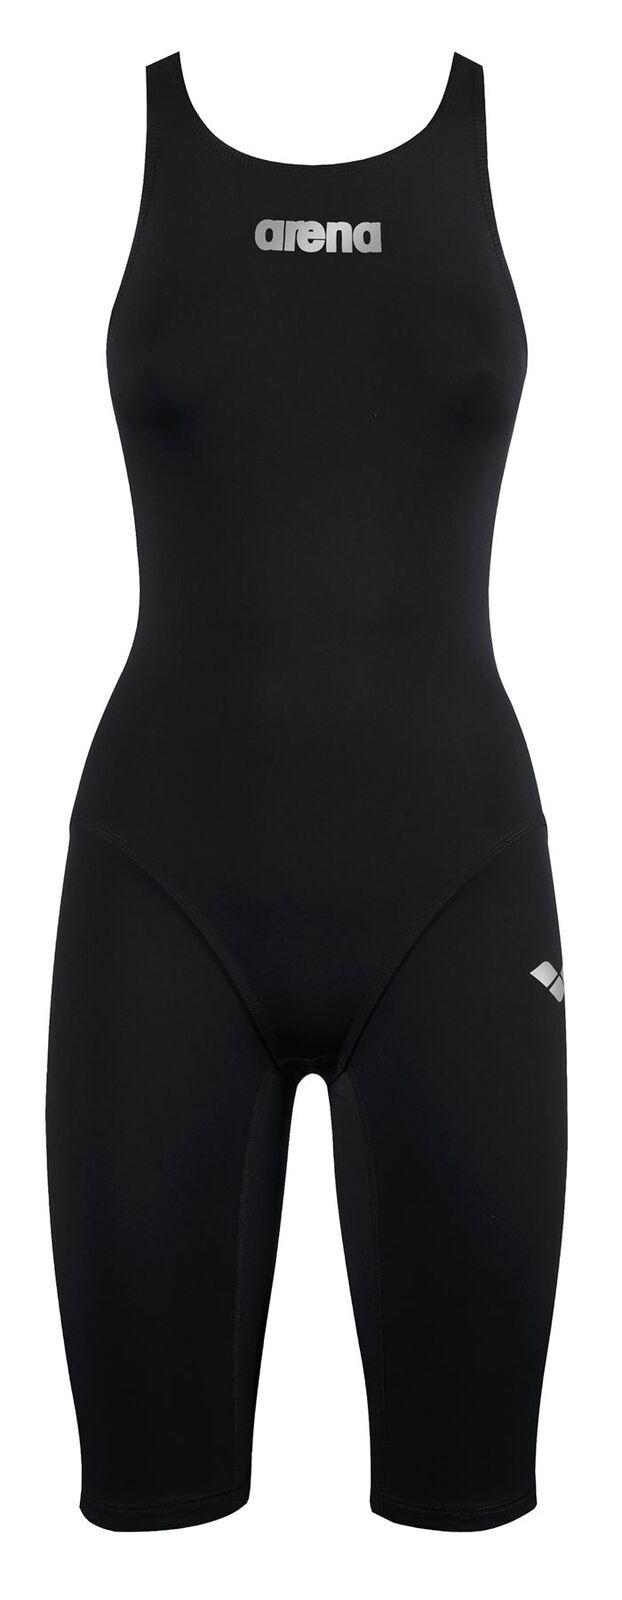 Arena - Ragazze Powerskin San Corpo Pieno Aperto Kneesuit- Nero - Kneesuits